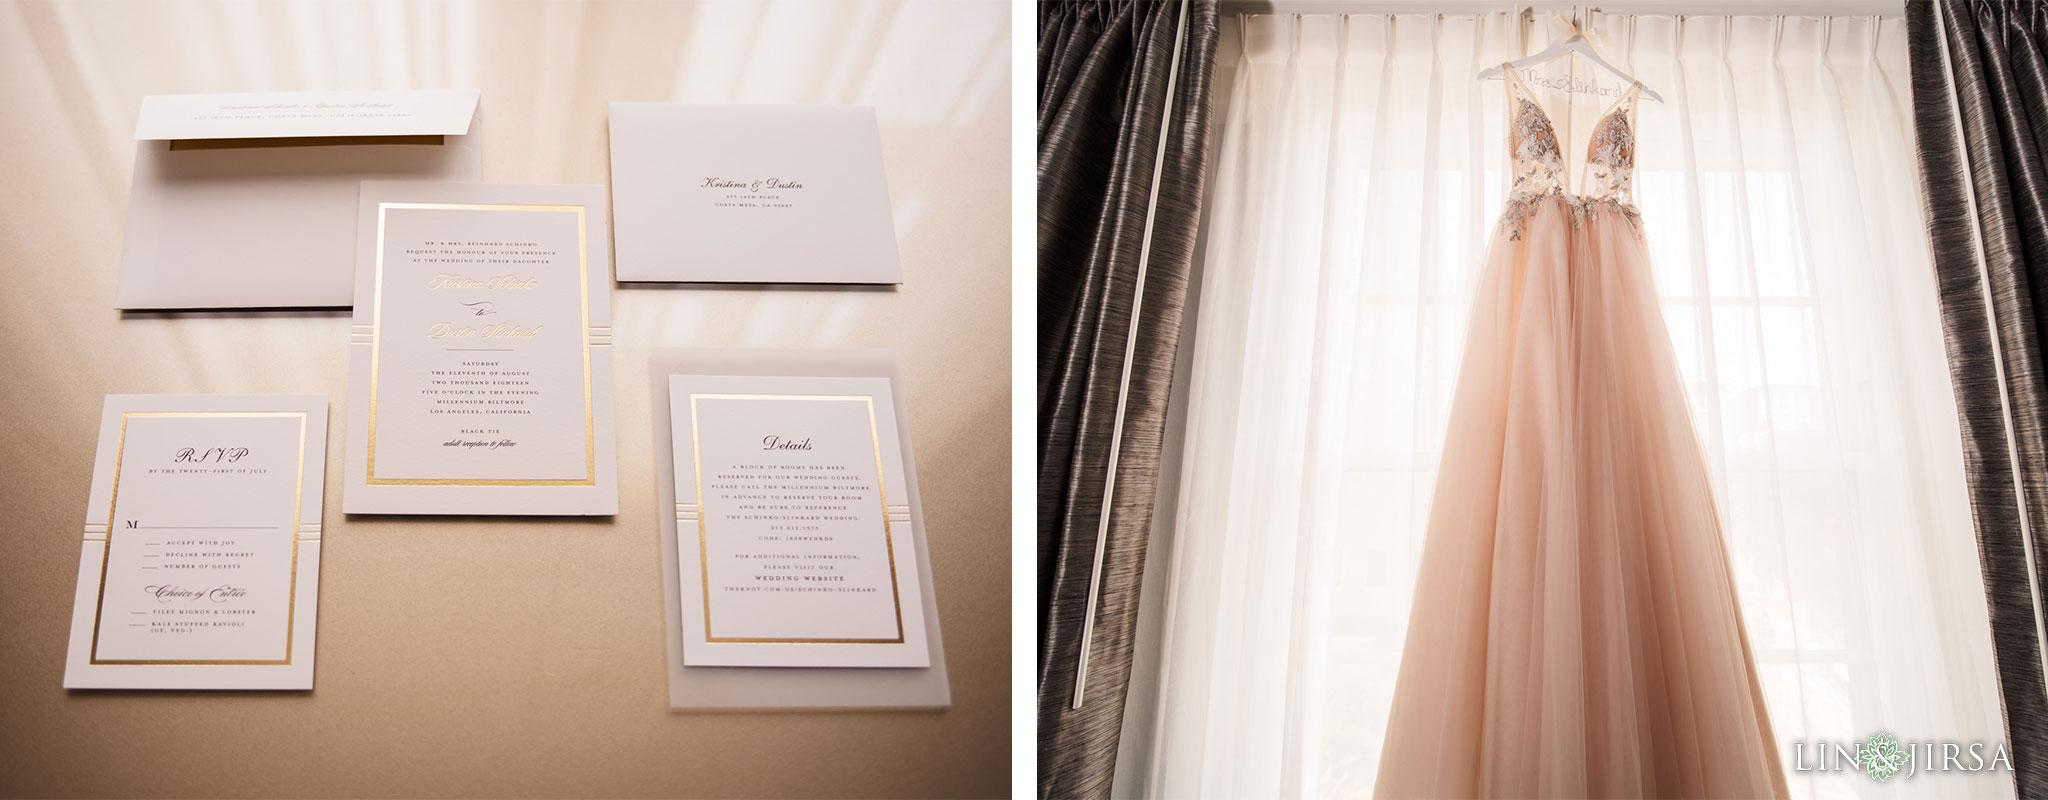 zms millennium biltmore hotel los angeles wedding photography